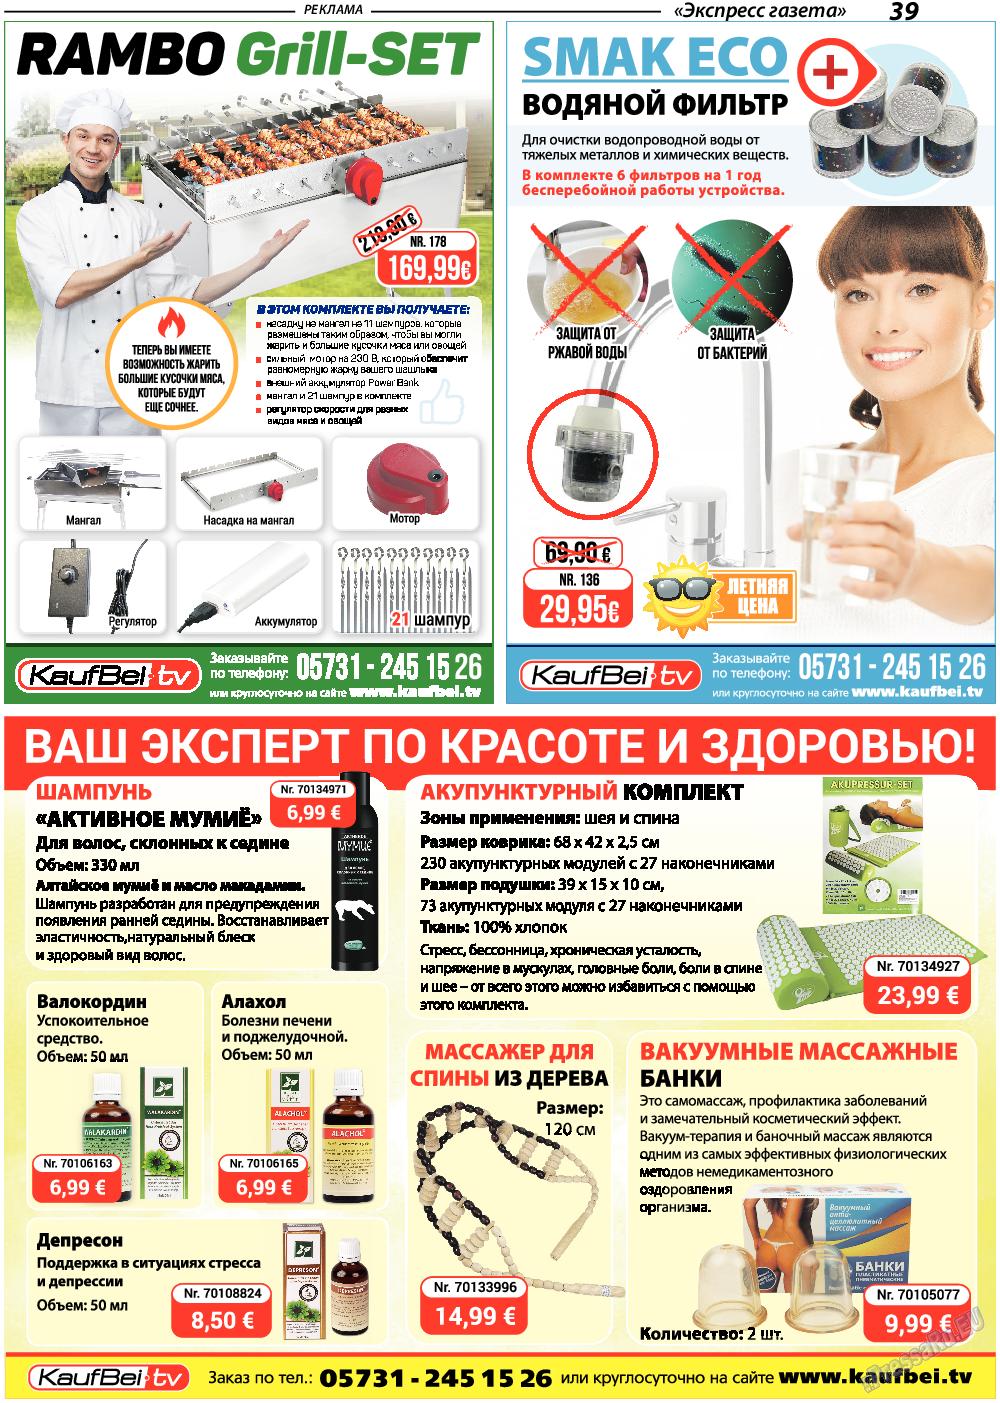 Экспресс газета (газета). 2018 год, номер 10, стр. 39